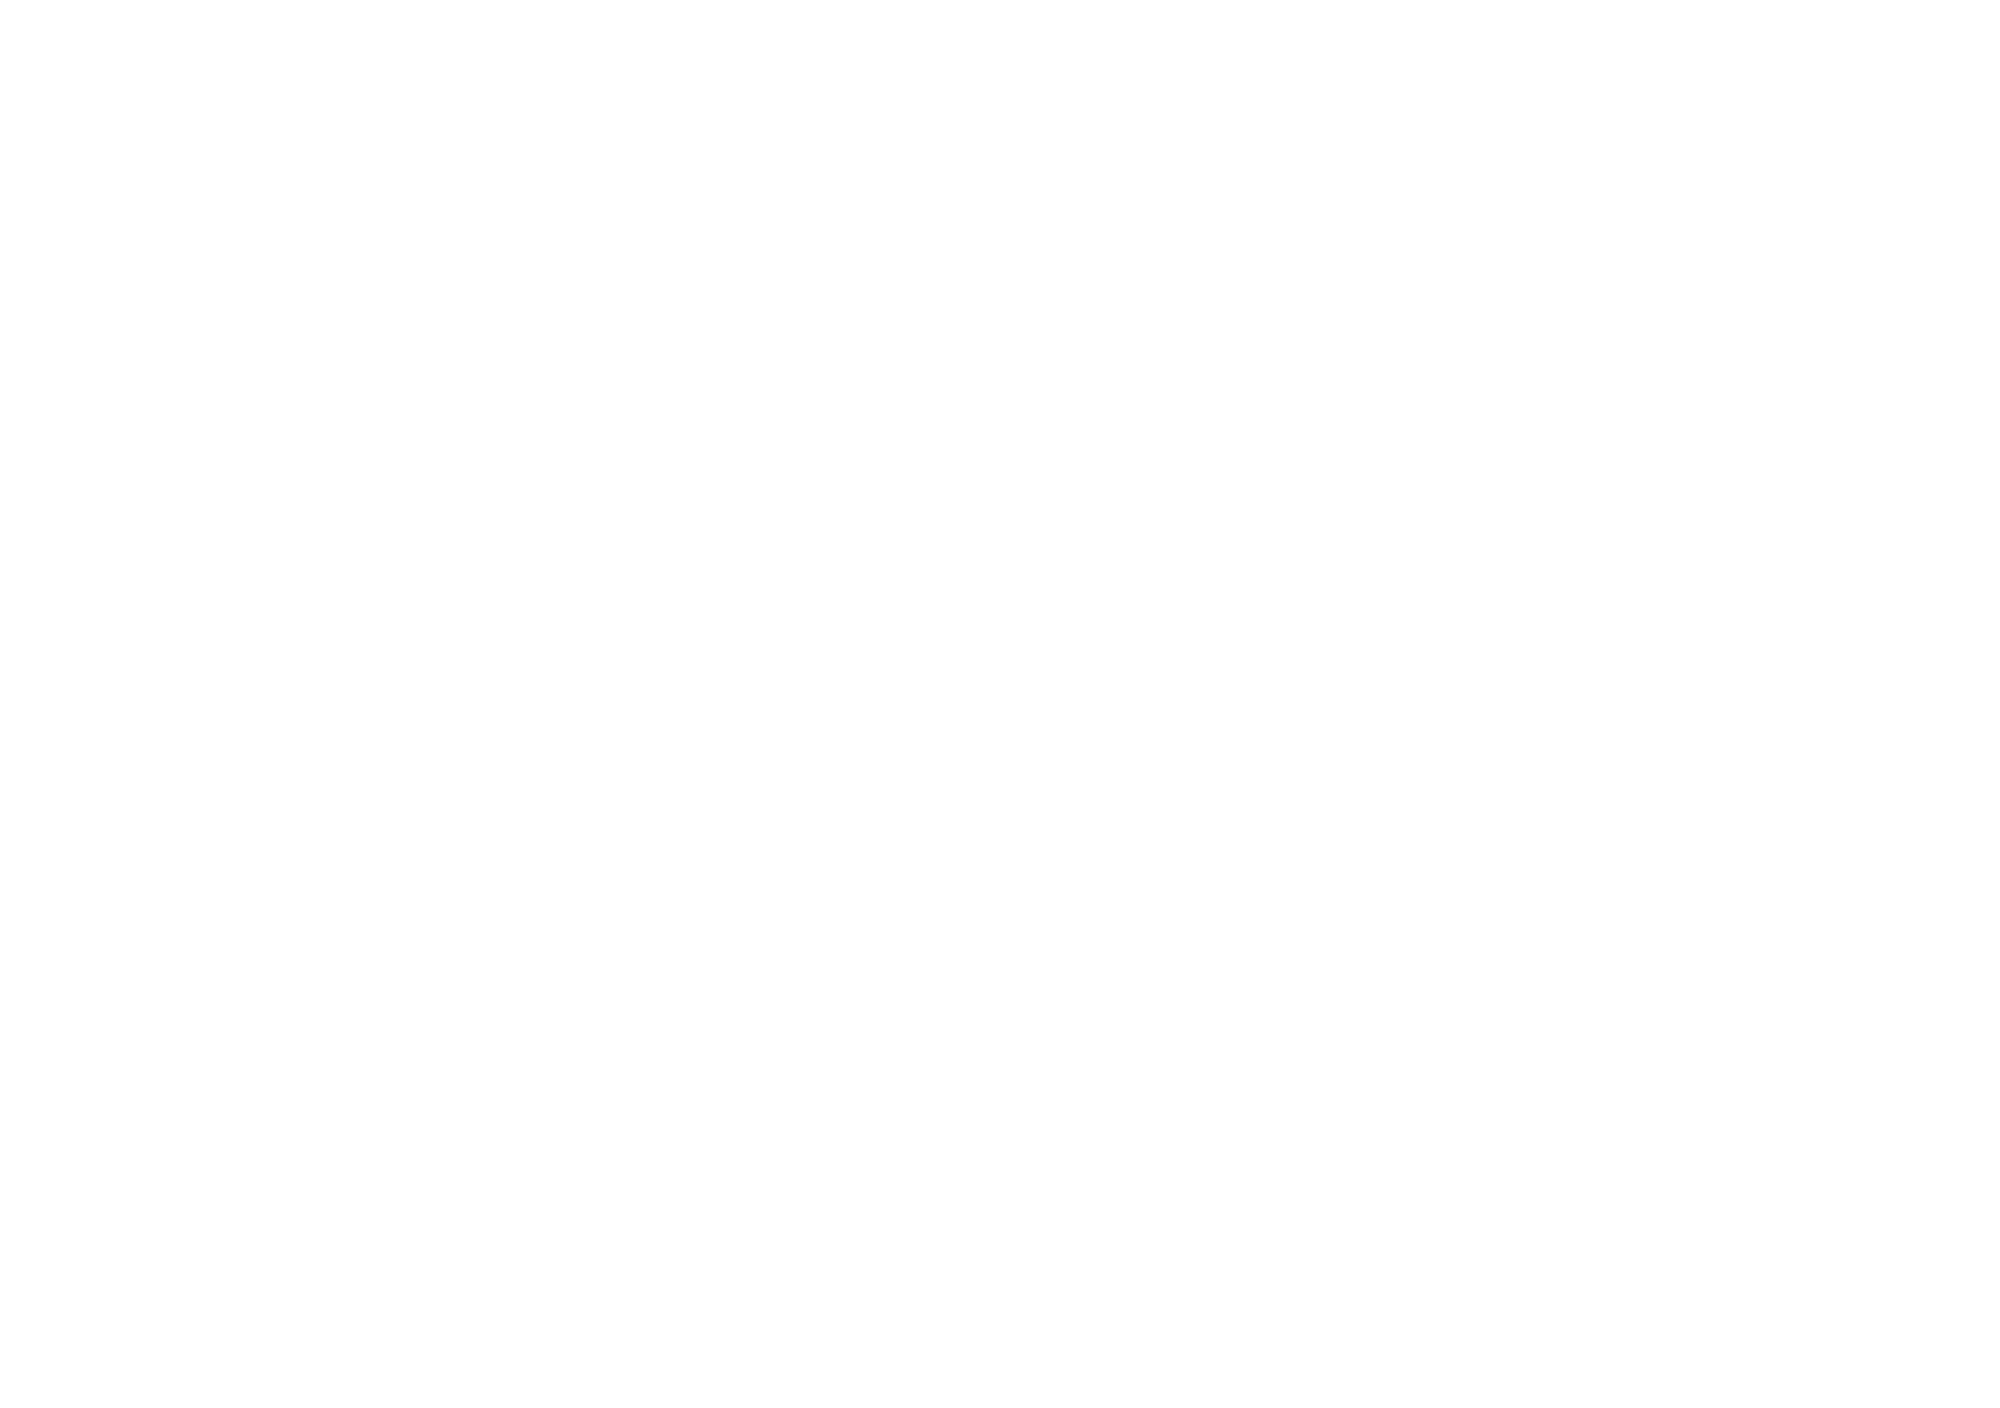 Cal Olson Design